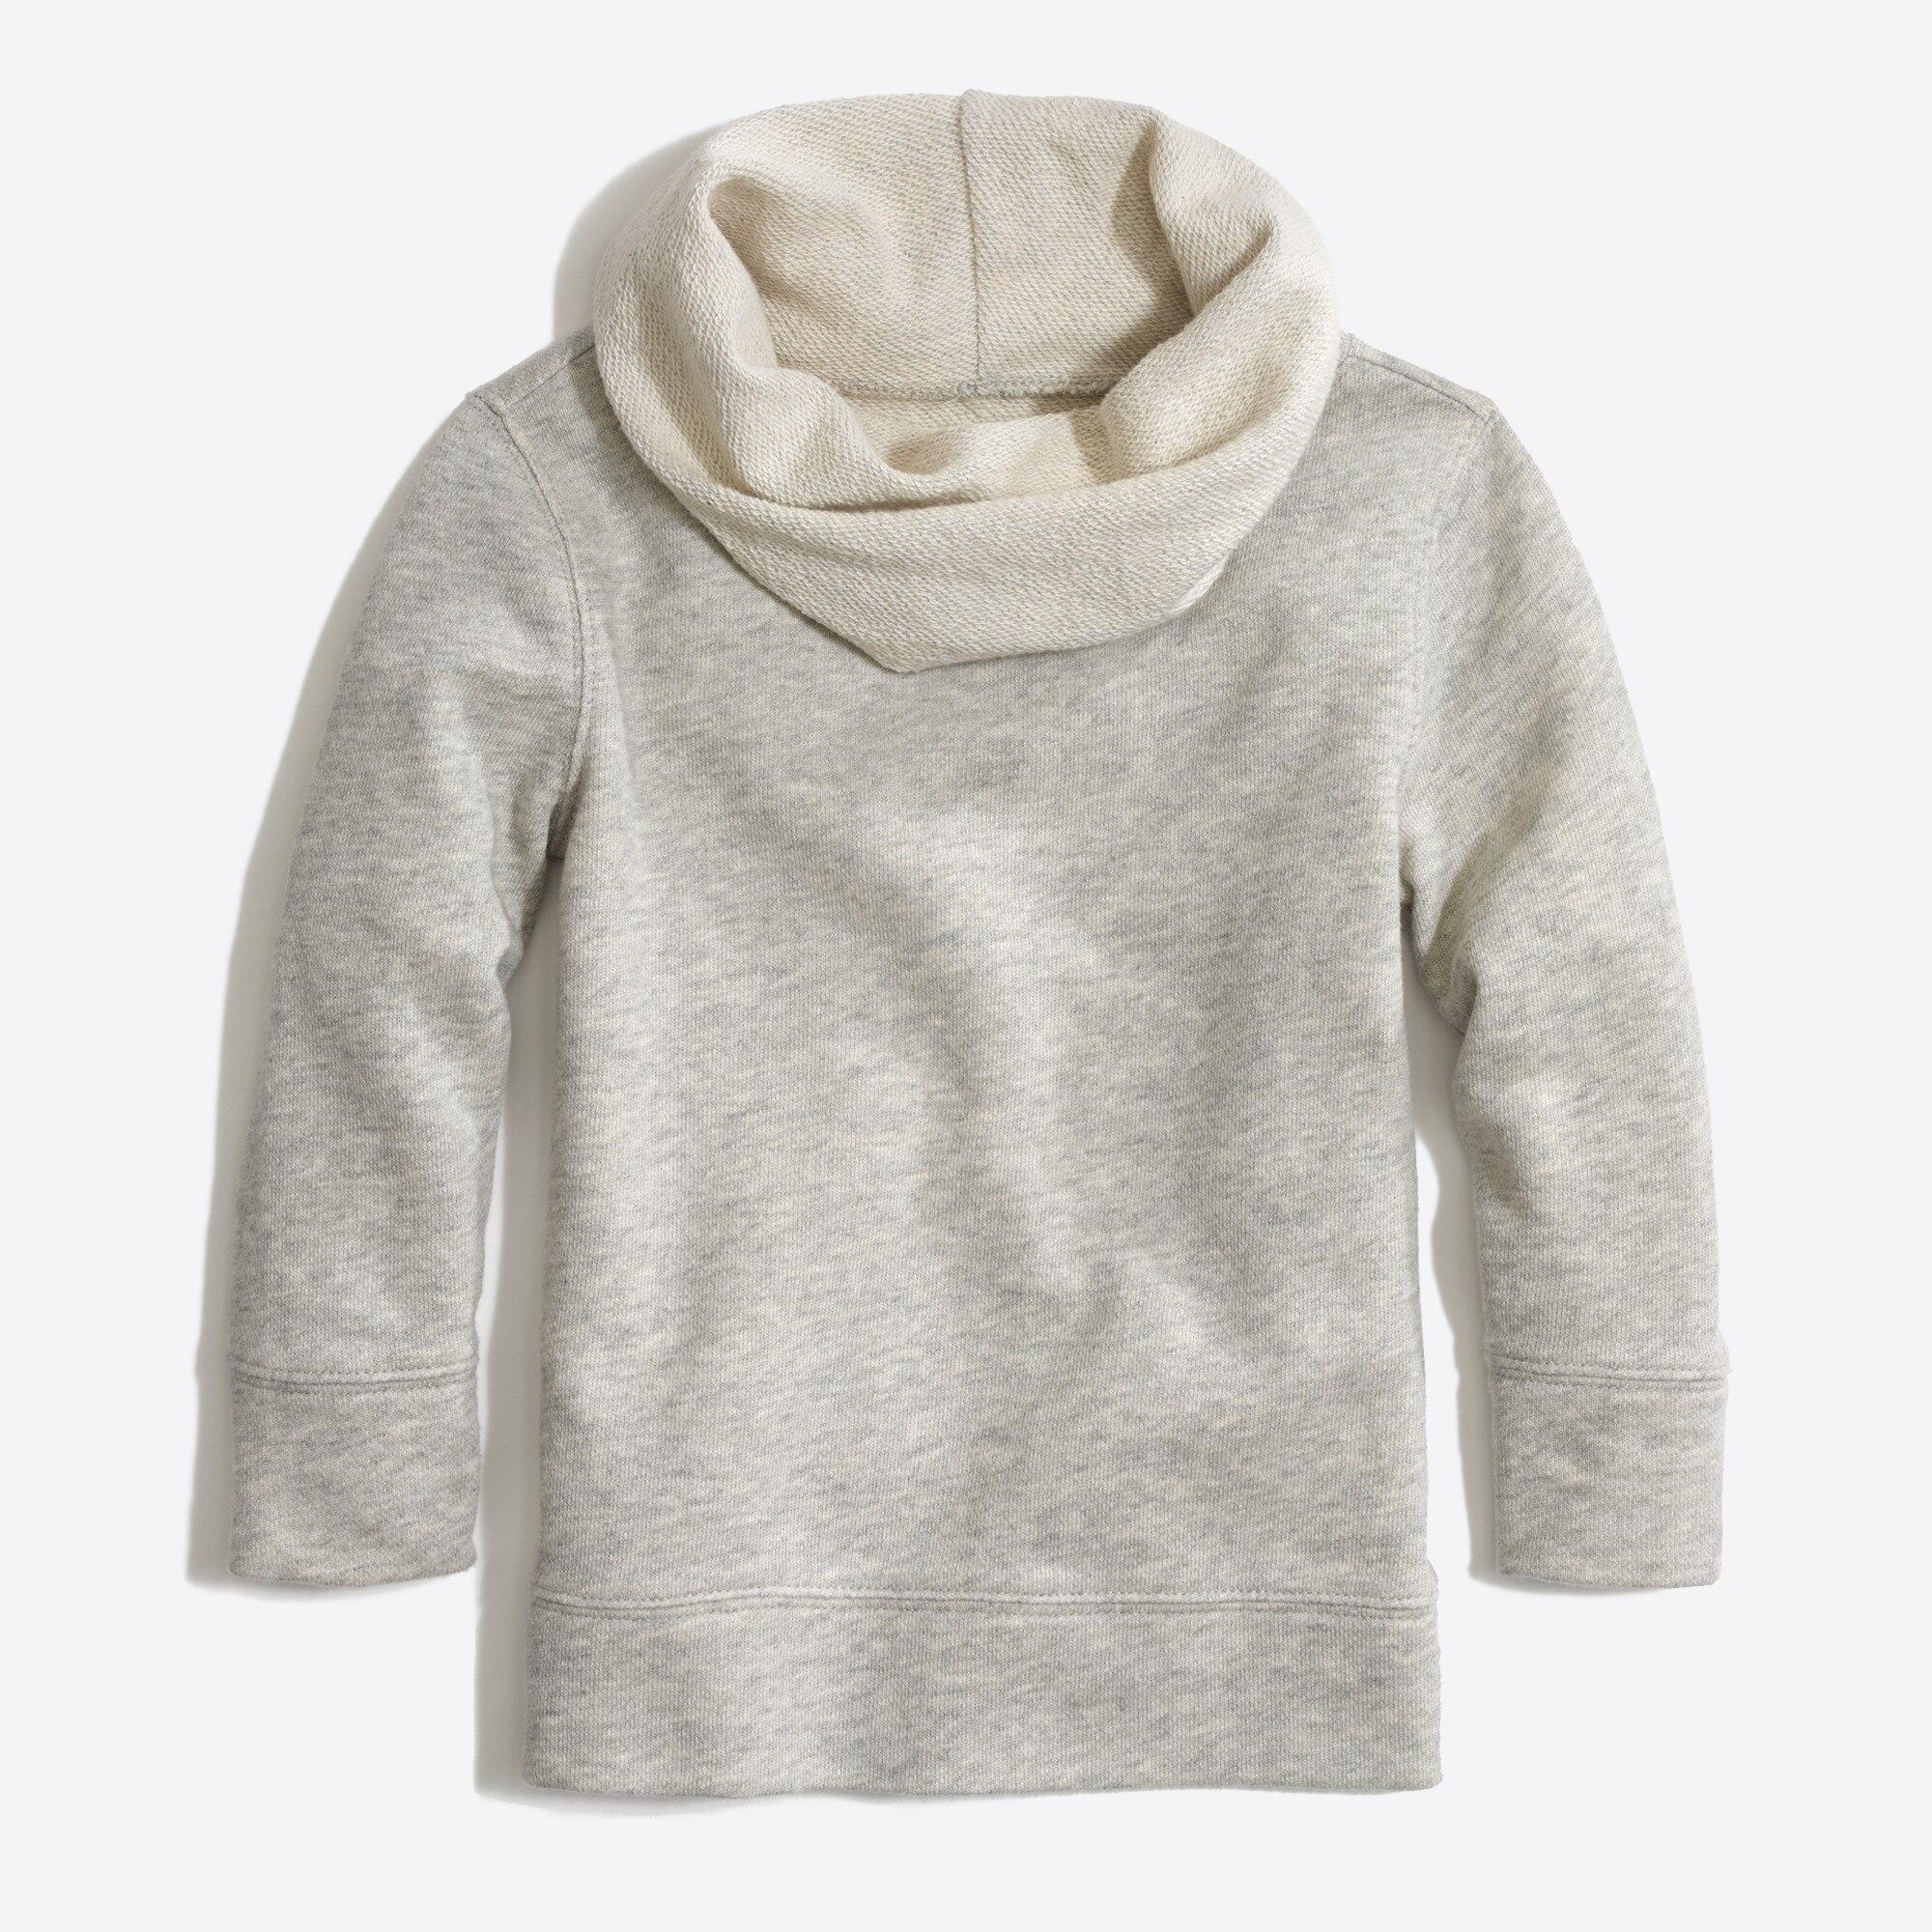 factory girls Girls' cowlneck sweatshirt